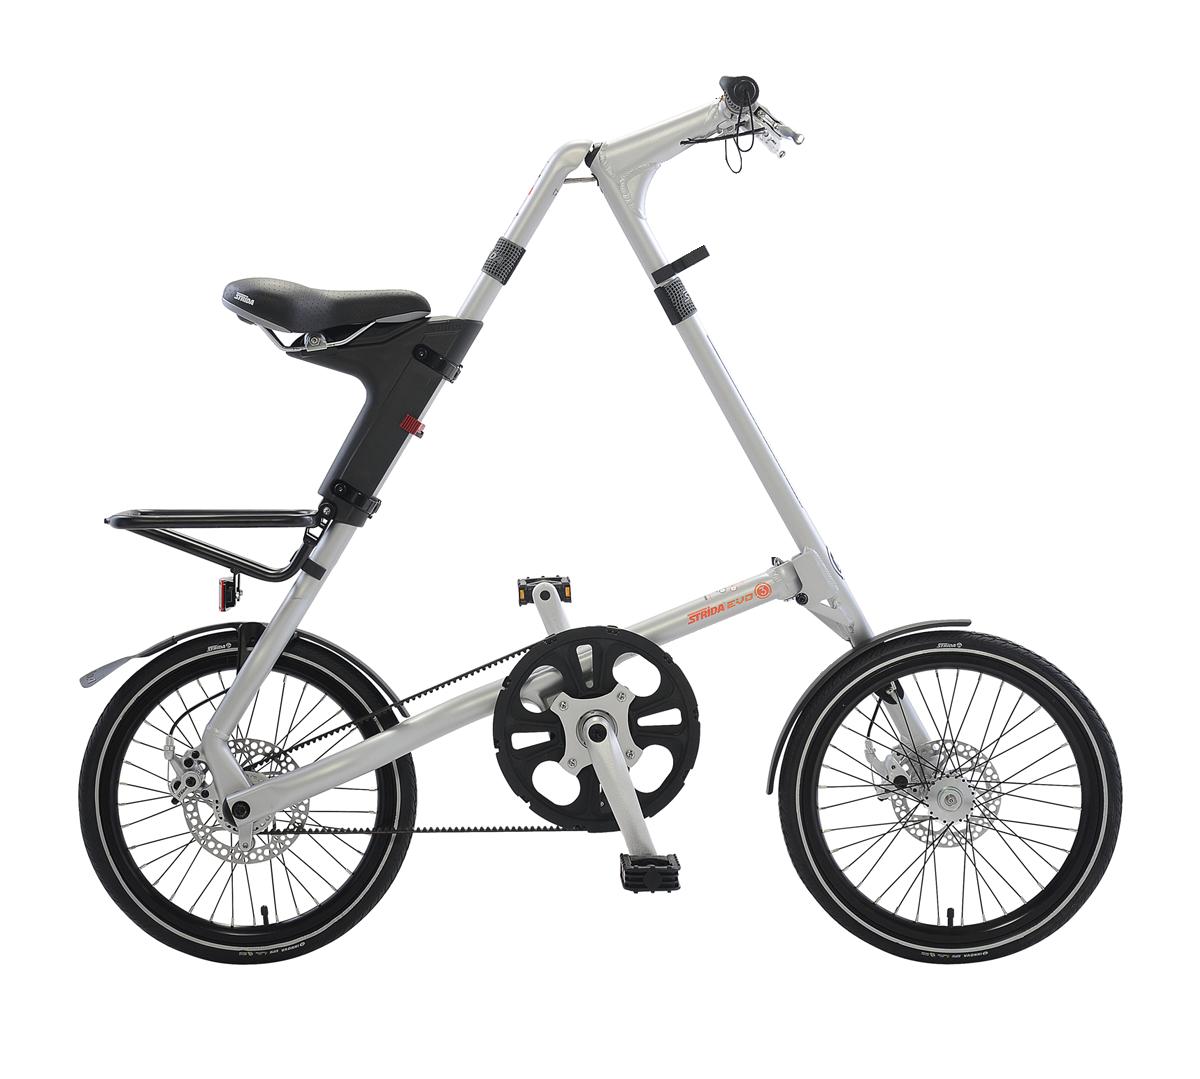 STRiDA EVO Folding Bicycle, Brushed Silver-0